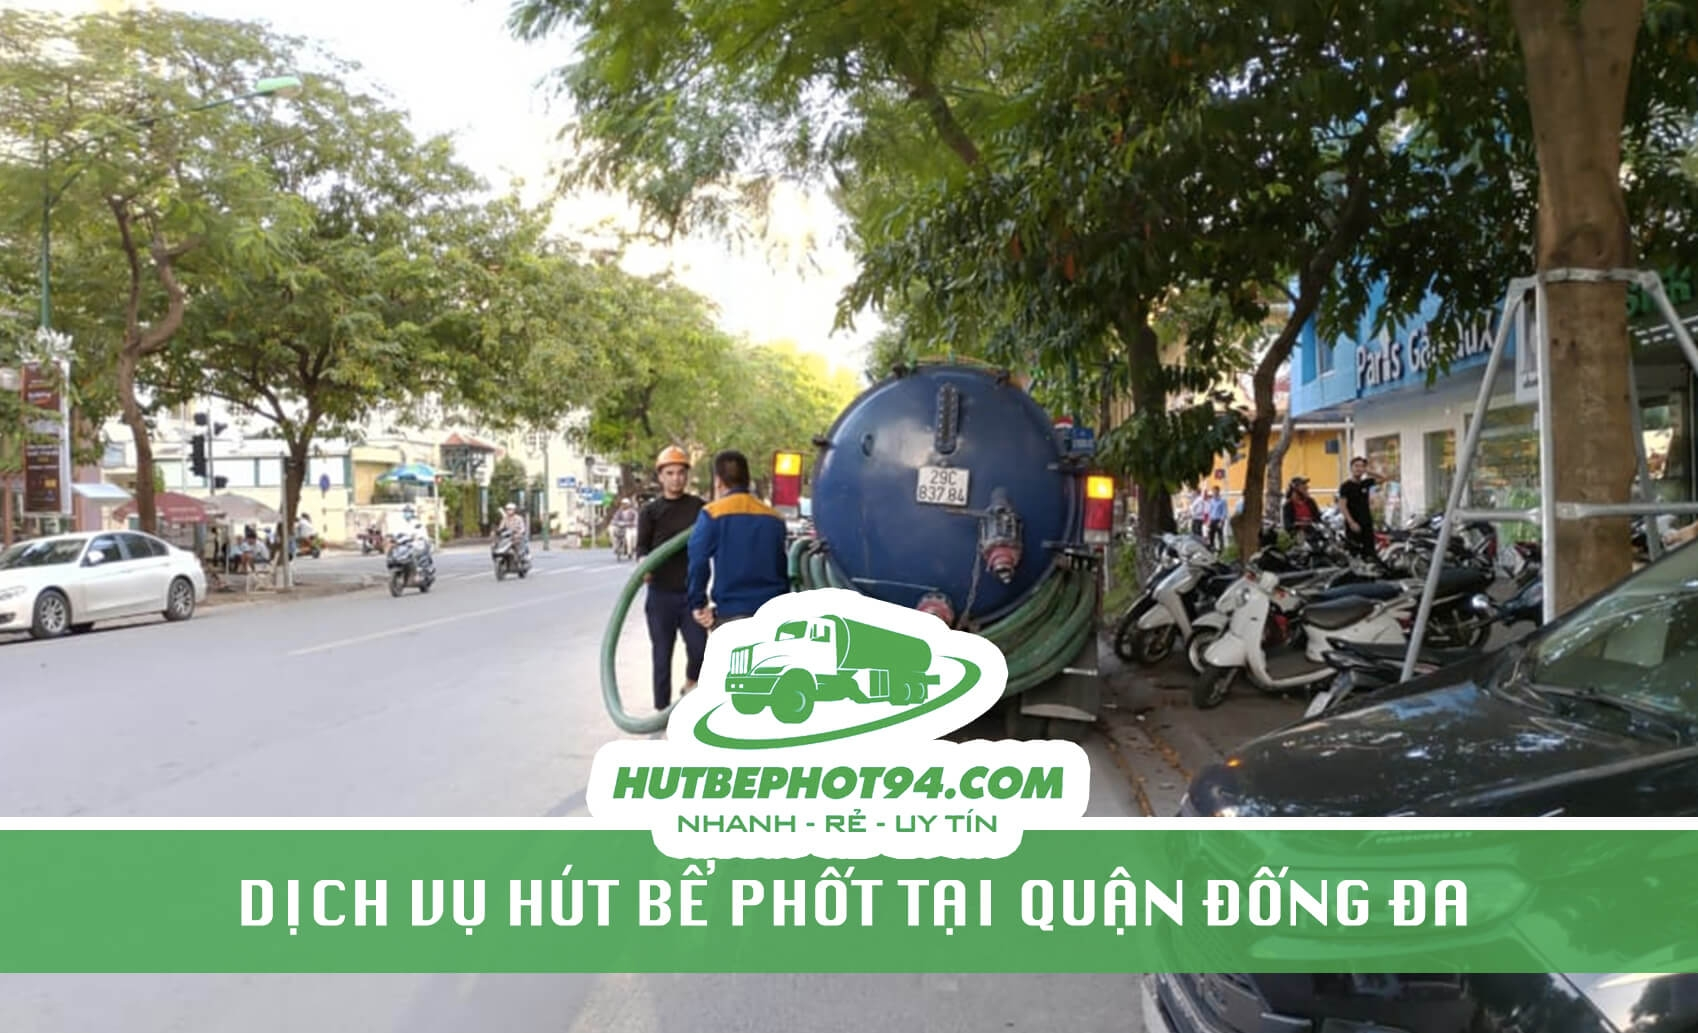 Hut be phot dong da (@hutbephotdongda94) Cover Image